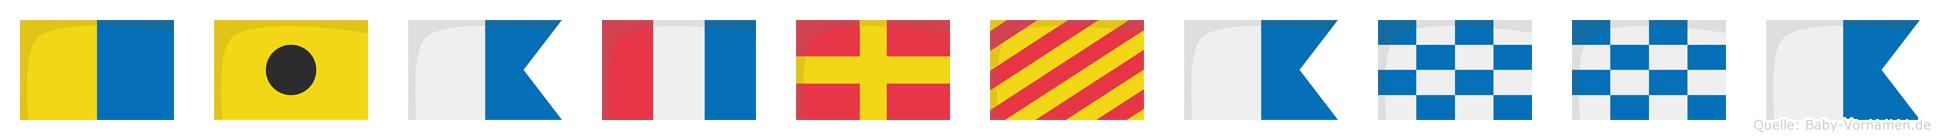 Kiatryanna im Flaggenalphabet